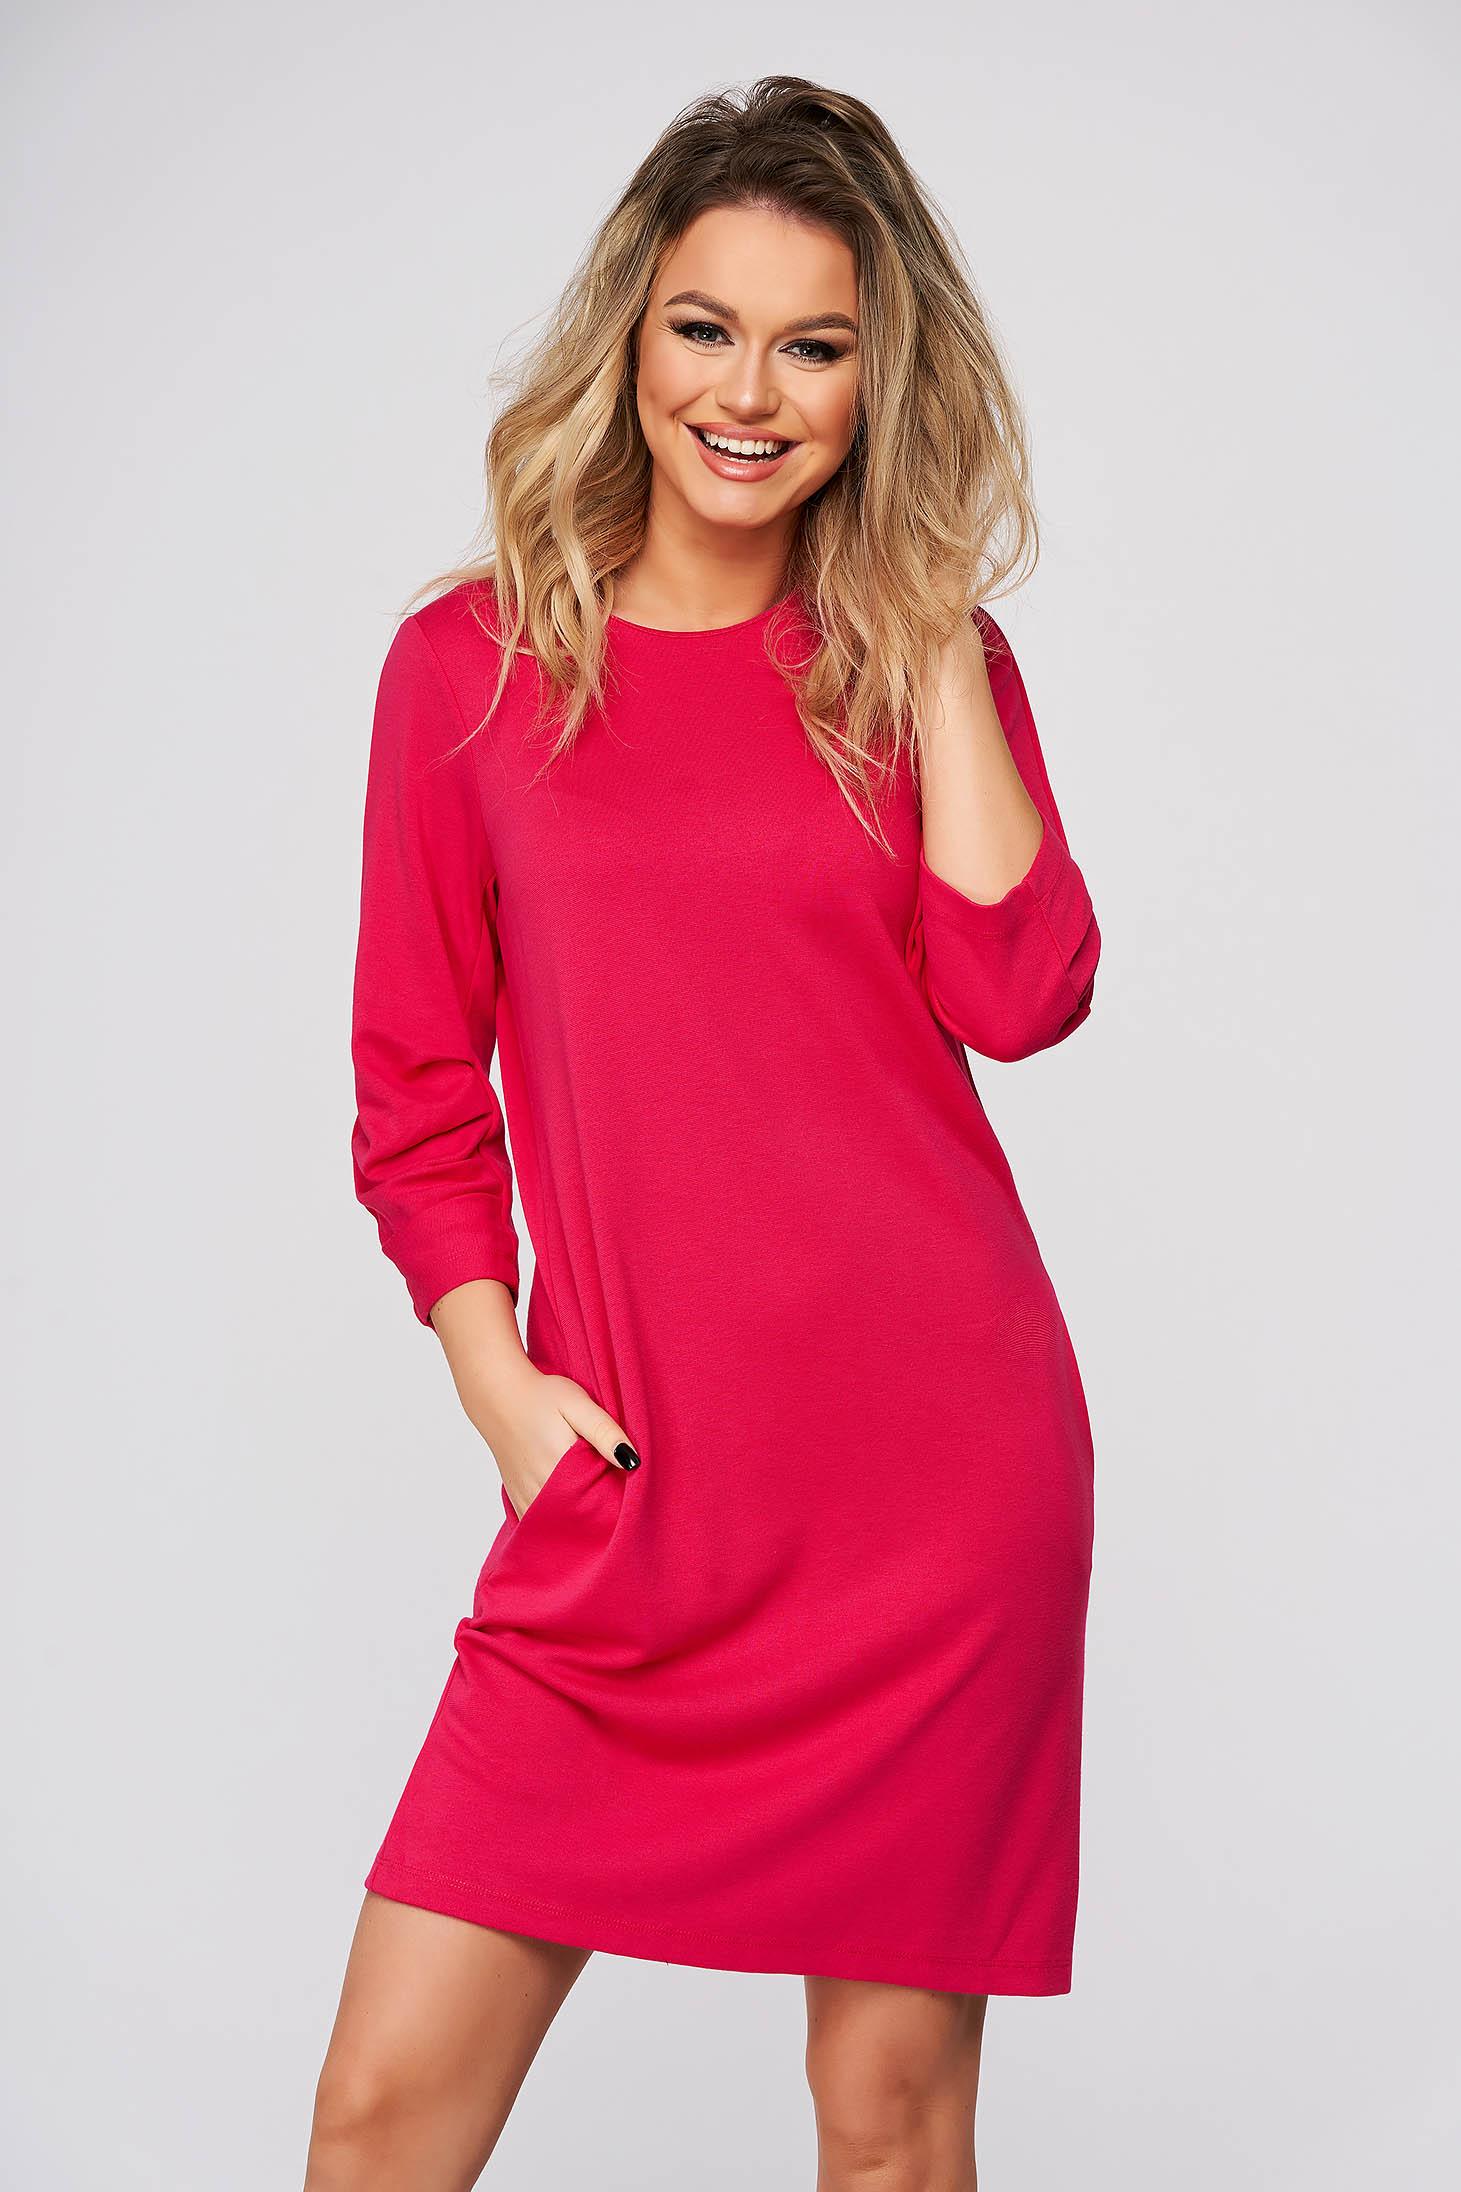 Rochie Top Secret roz scurta casual din material usor elastic